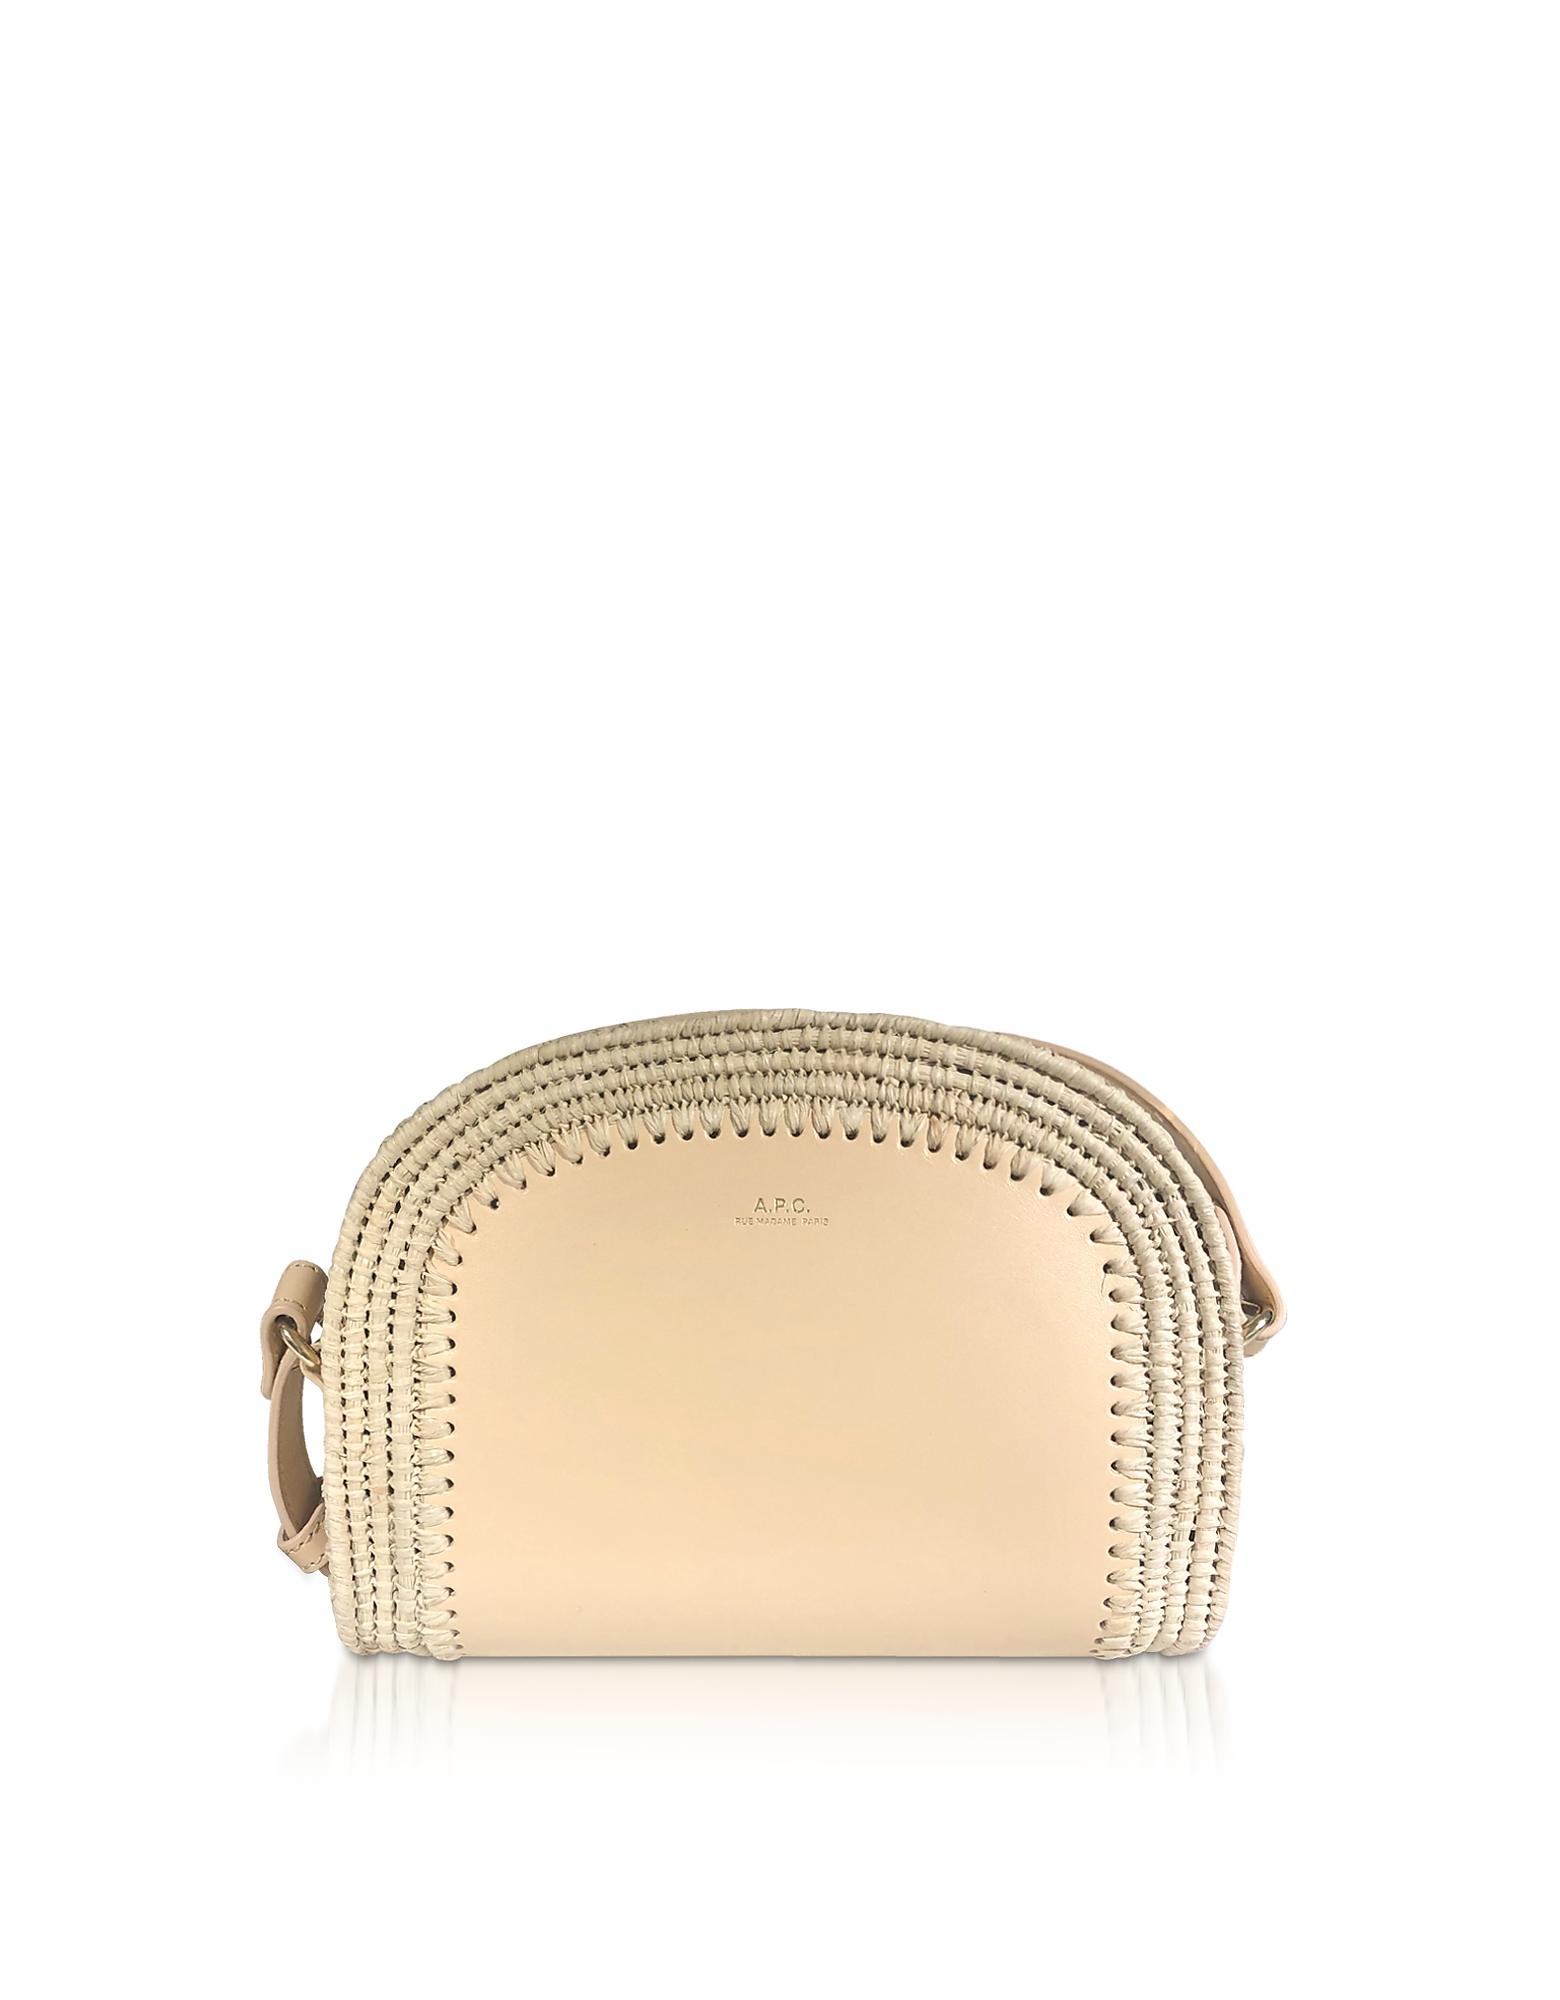 A.P.C. Designer Handbags, Woven Straw & Natural Beige Leather Mini Demi-Lune Crossbody Bag